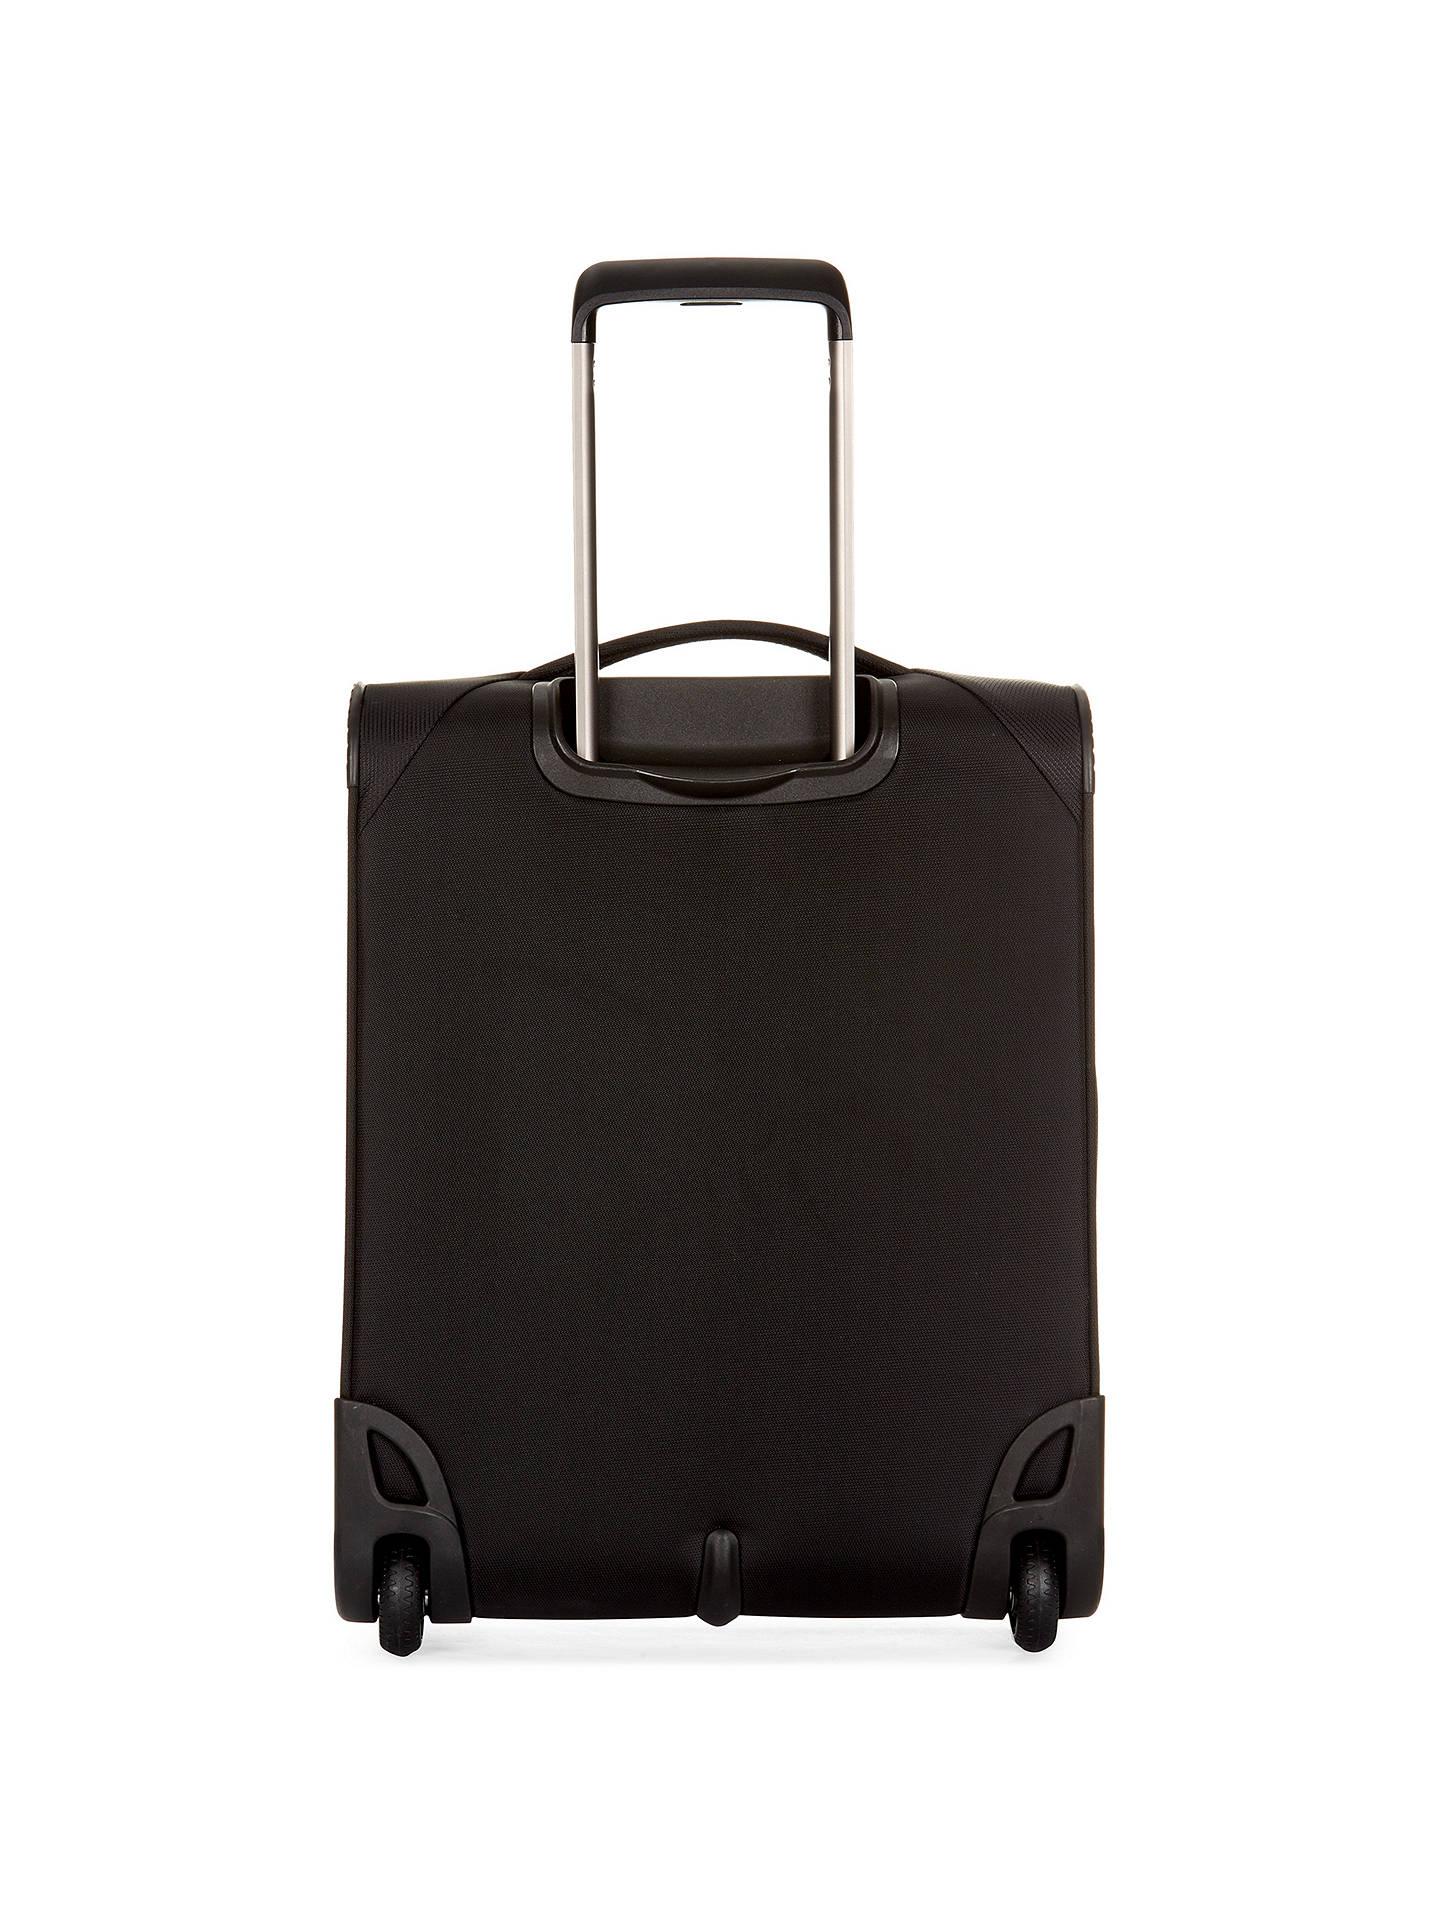 c6e65ac99 Buy Antler Cyberlite II 2-Wheel 55cm Cabin Suitcase, Black Online at  johnlewis.